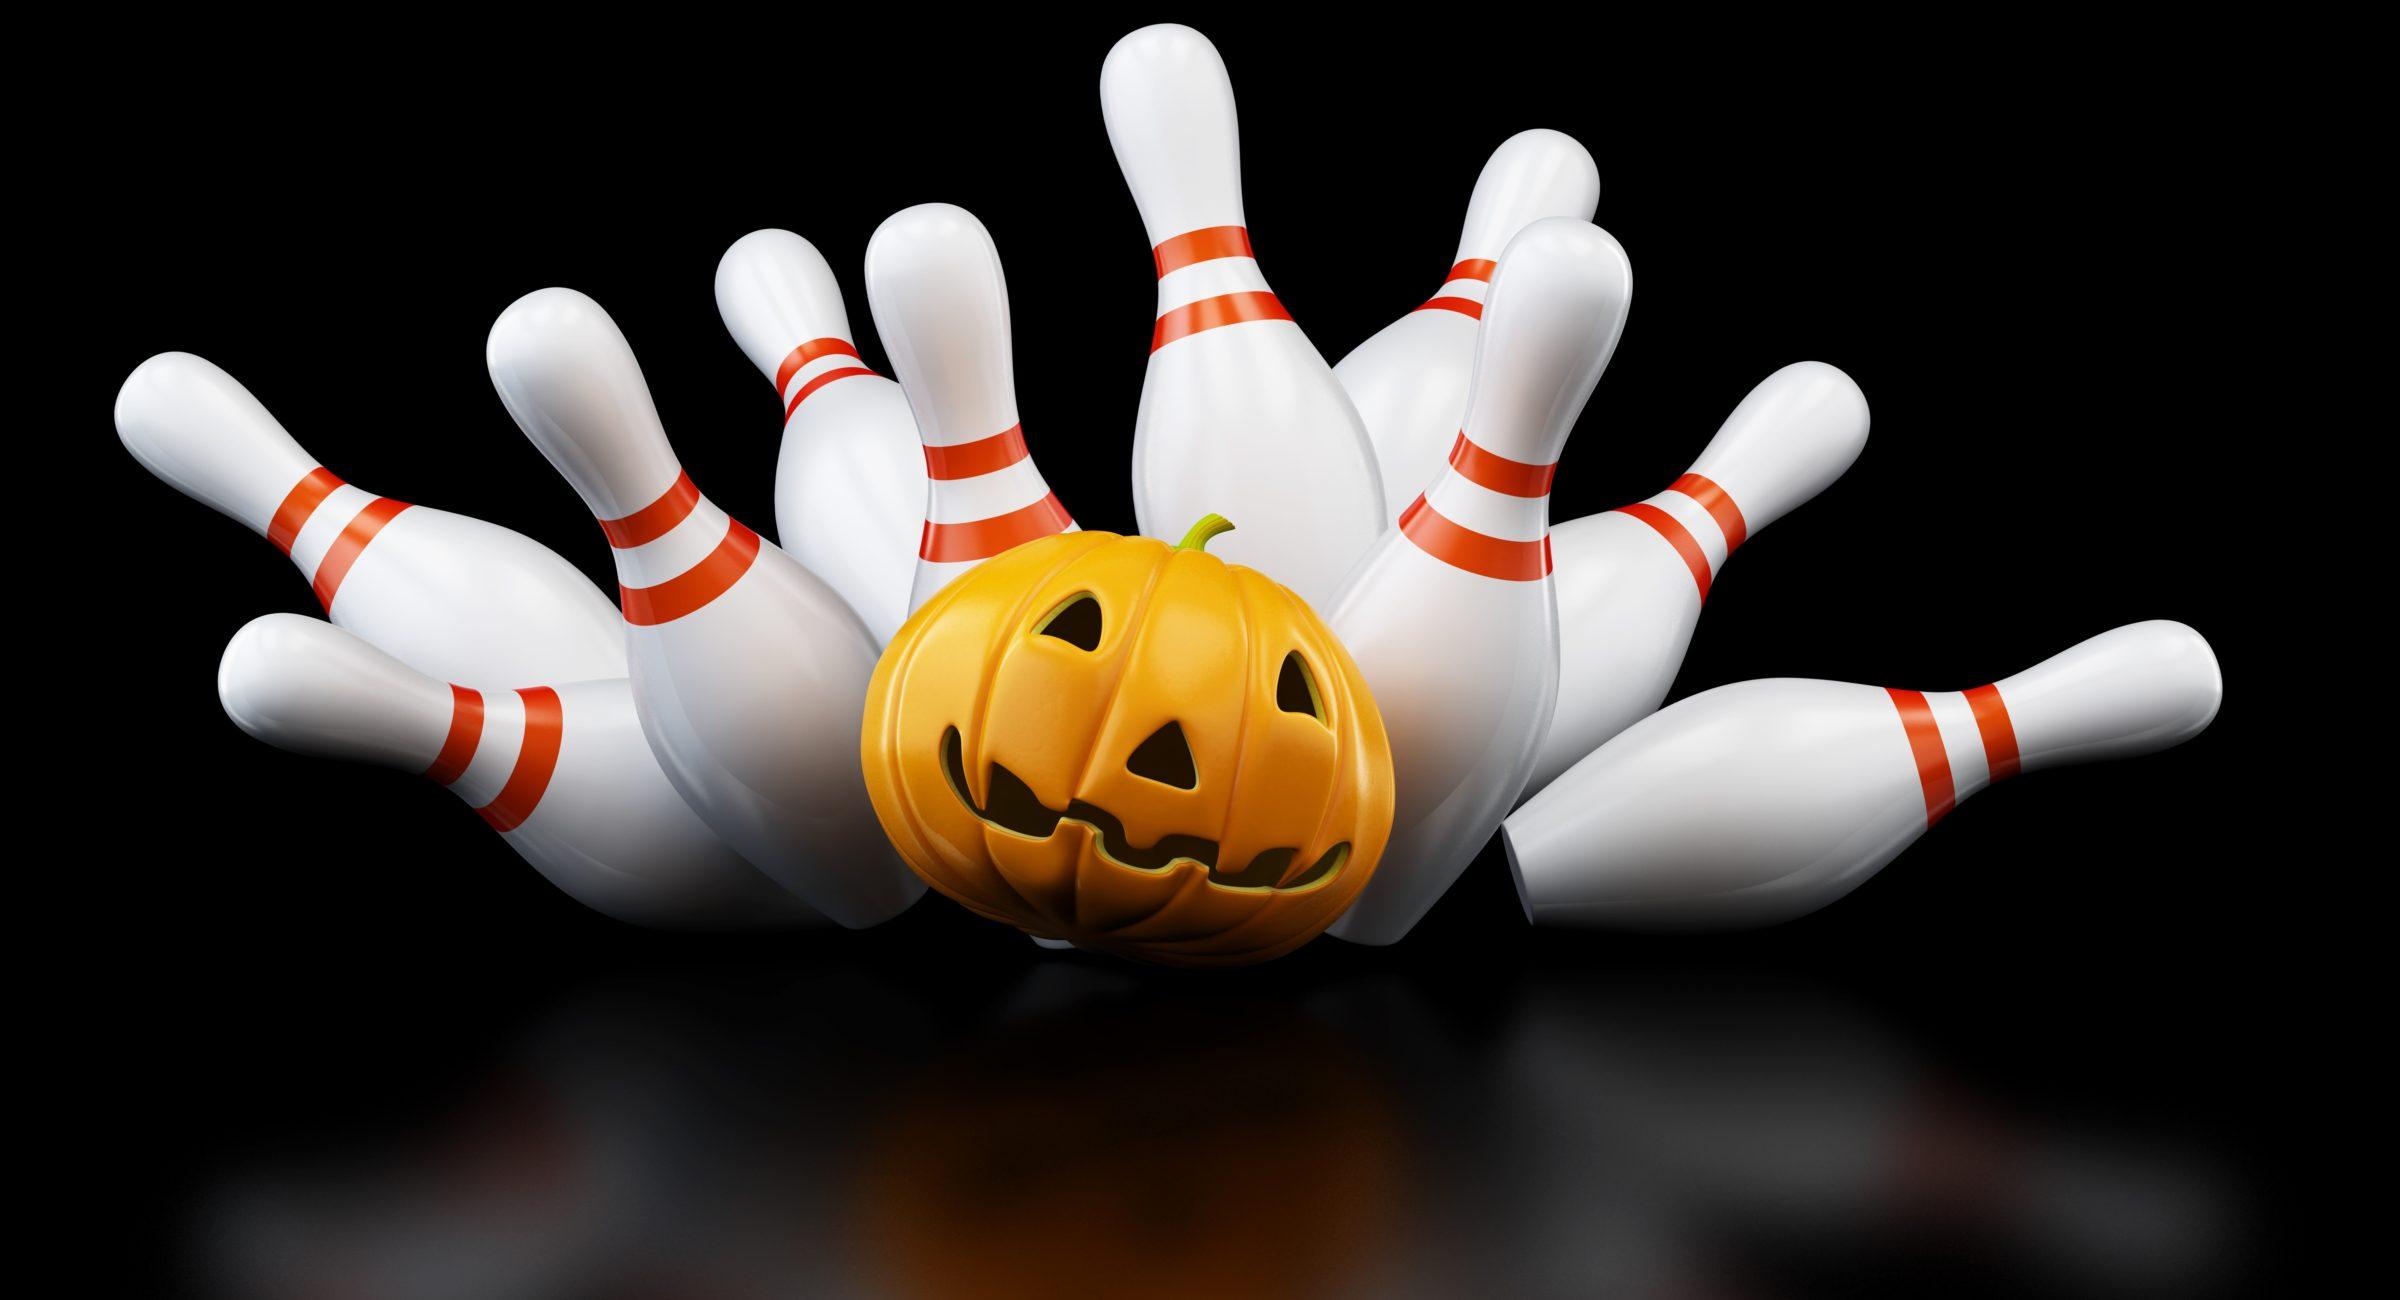 pumpkin crashing into the bowling pins